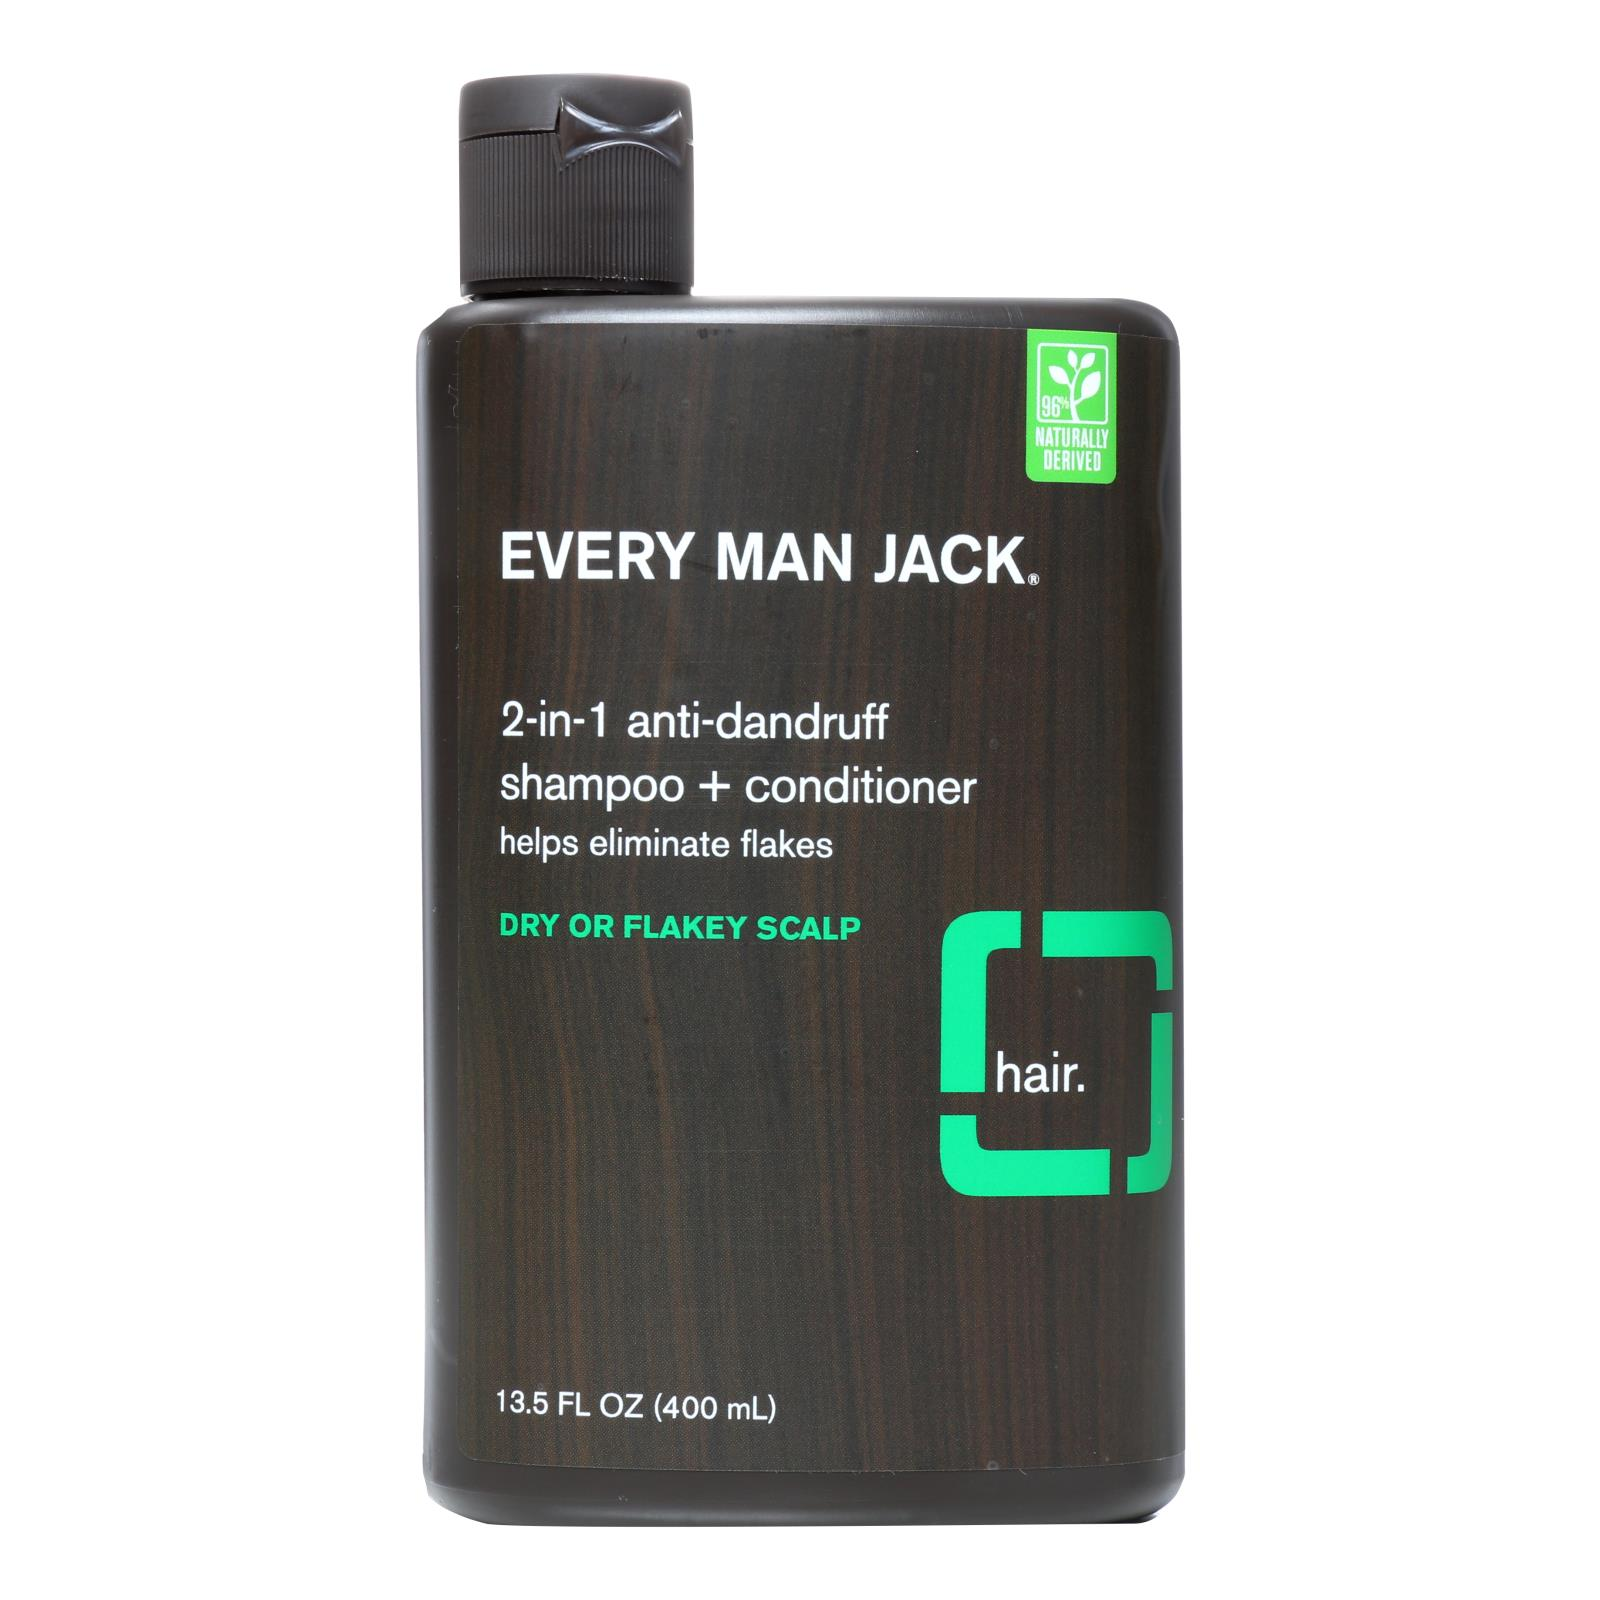 Every Man Jack Shampoo - 2In1 - Anti-Dandruff - 13.50 fl oz